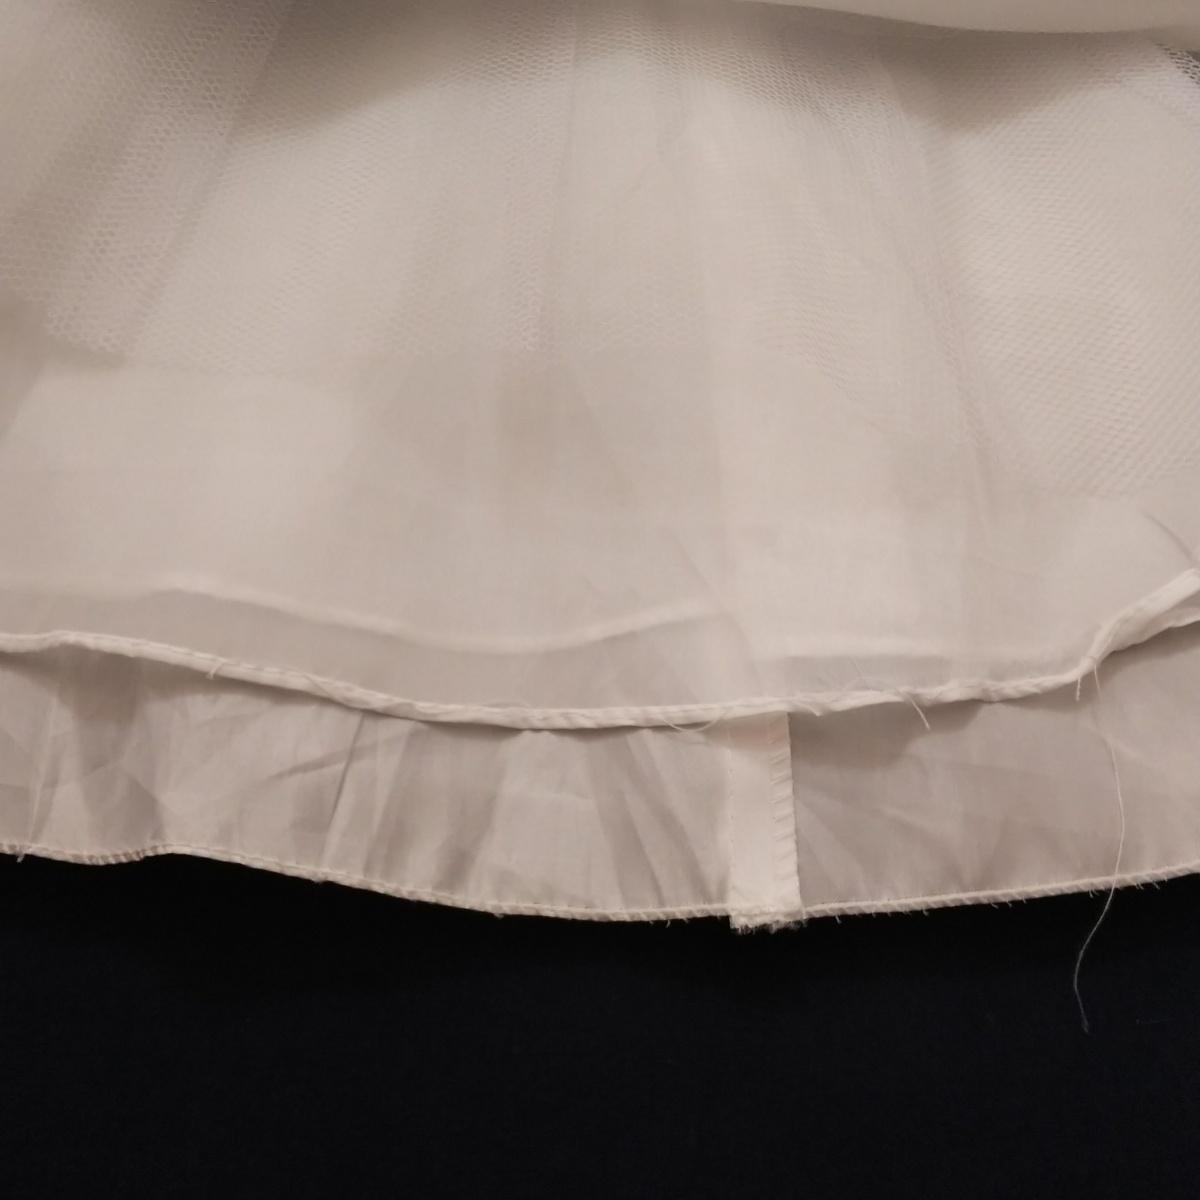 *FI5 AiMengBaby インポート 150 女の子 女子 フォーマル ドレス ワンピース ノースリーブ 白 紫 パープル 花 リボン 発表会 セレモニー_画像4